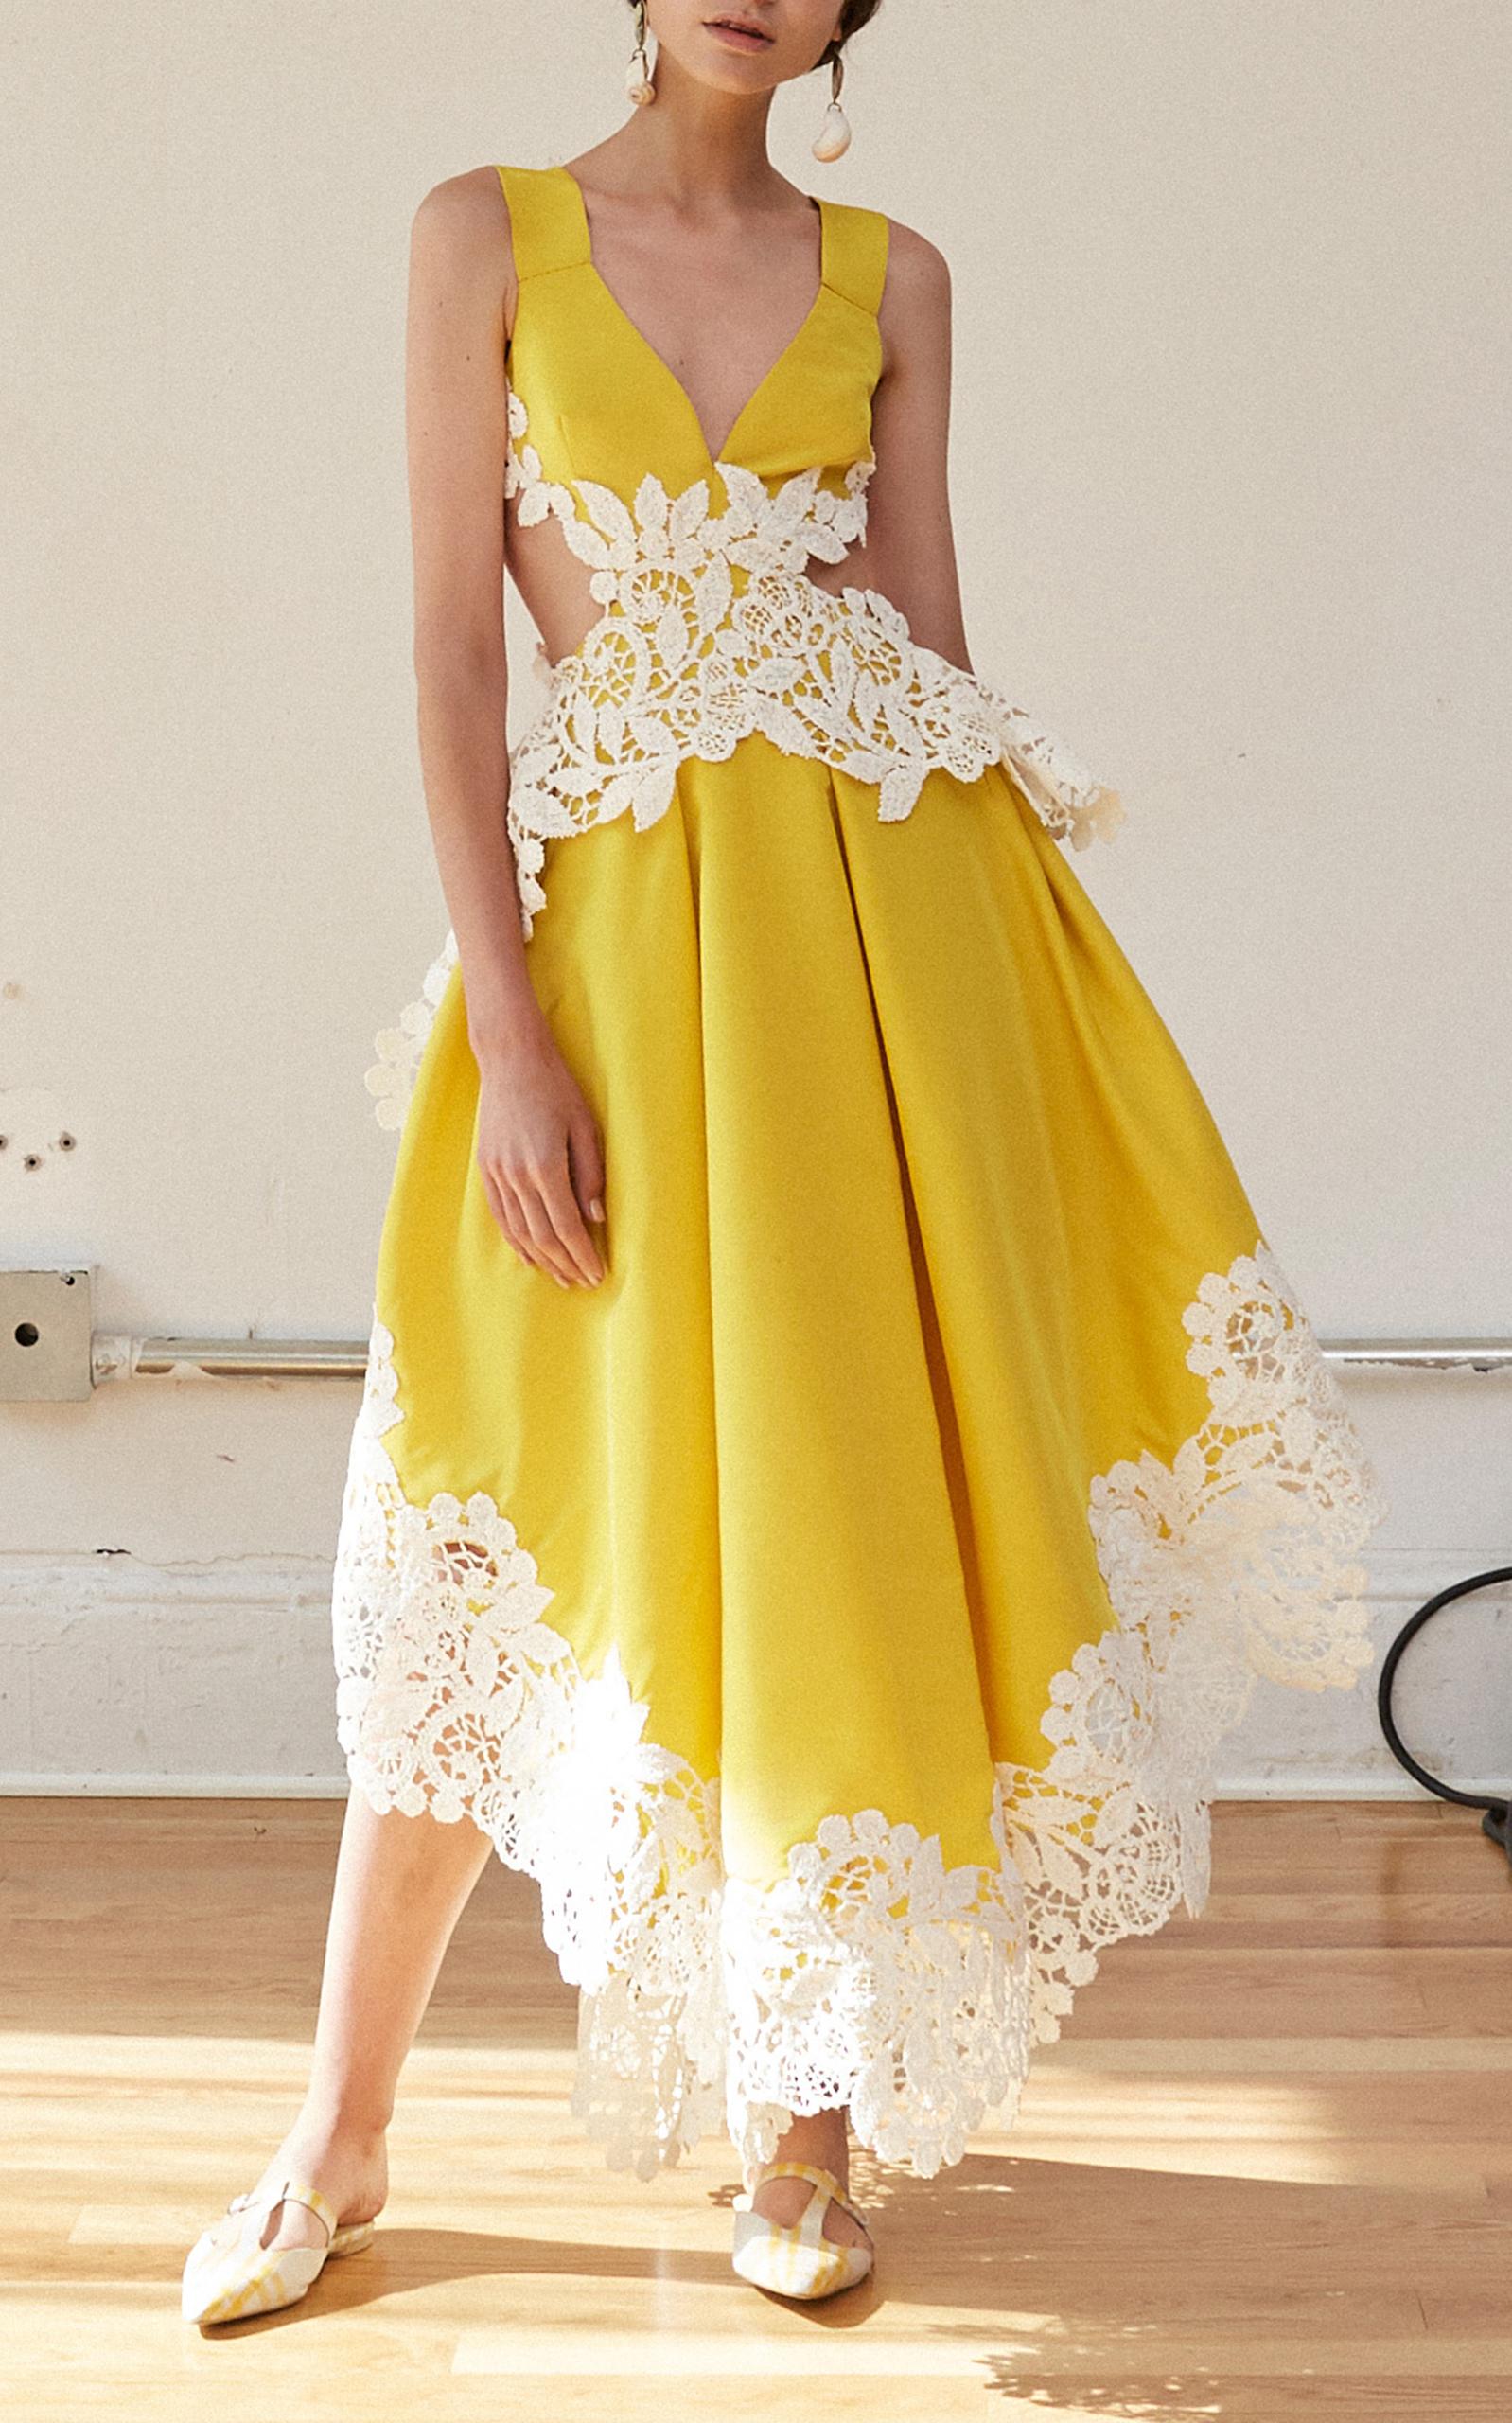 Just Let Me Live Dress Rosie Assoulin tyz9hh